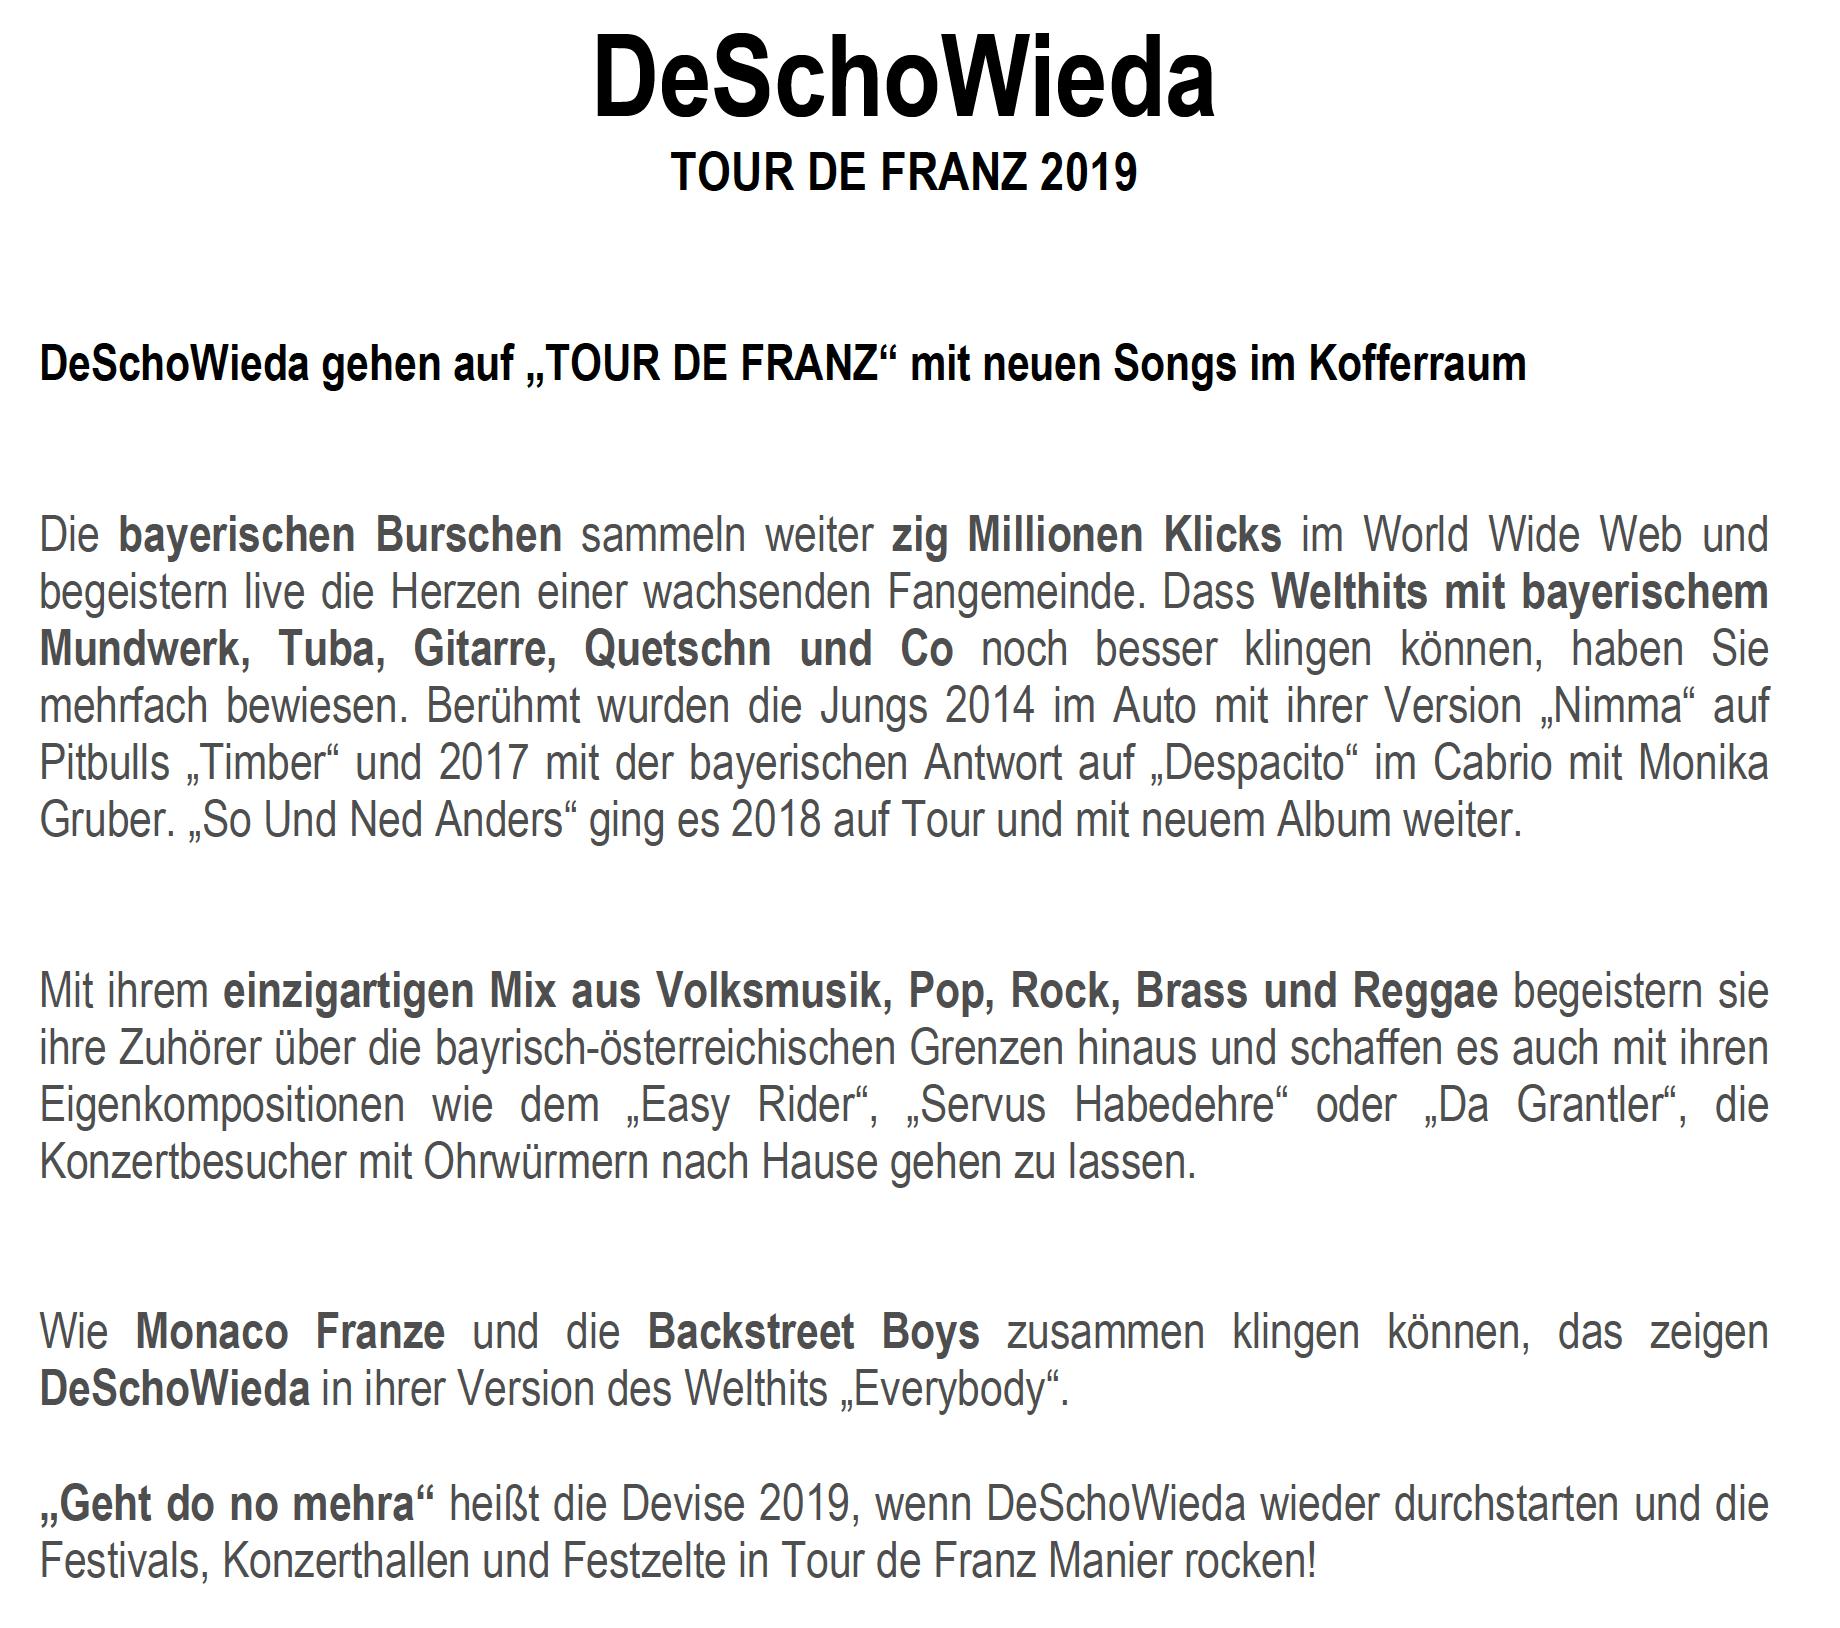 DeSchoWieda - Bayrische Popmusik